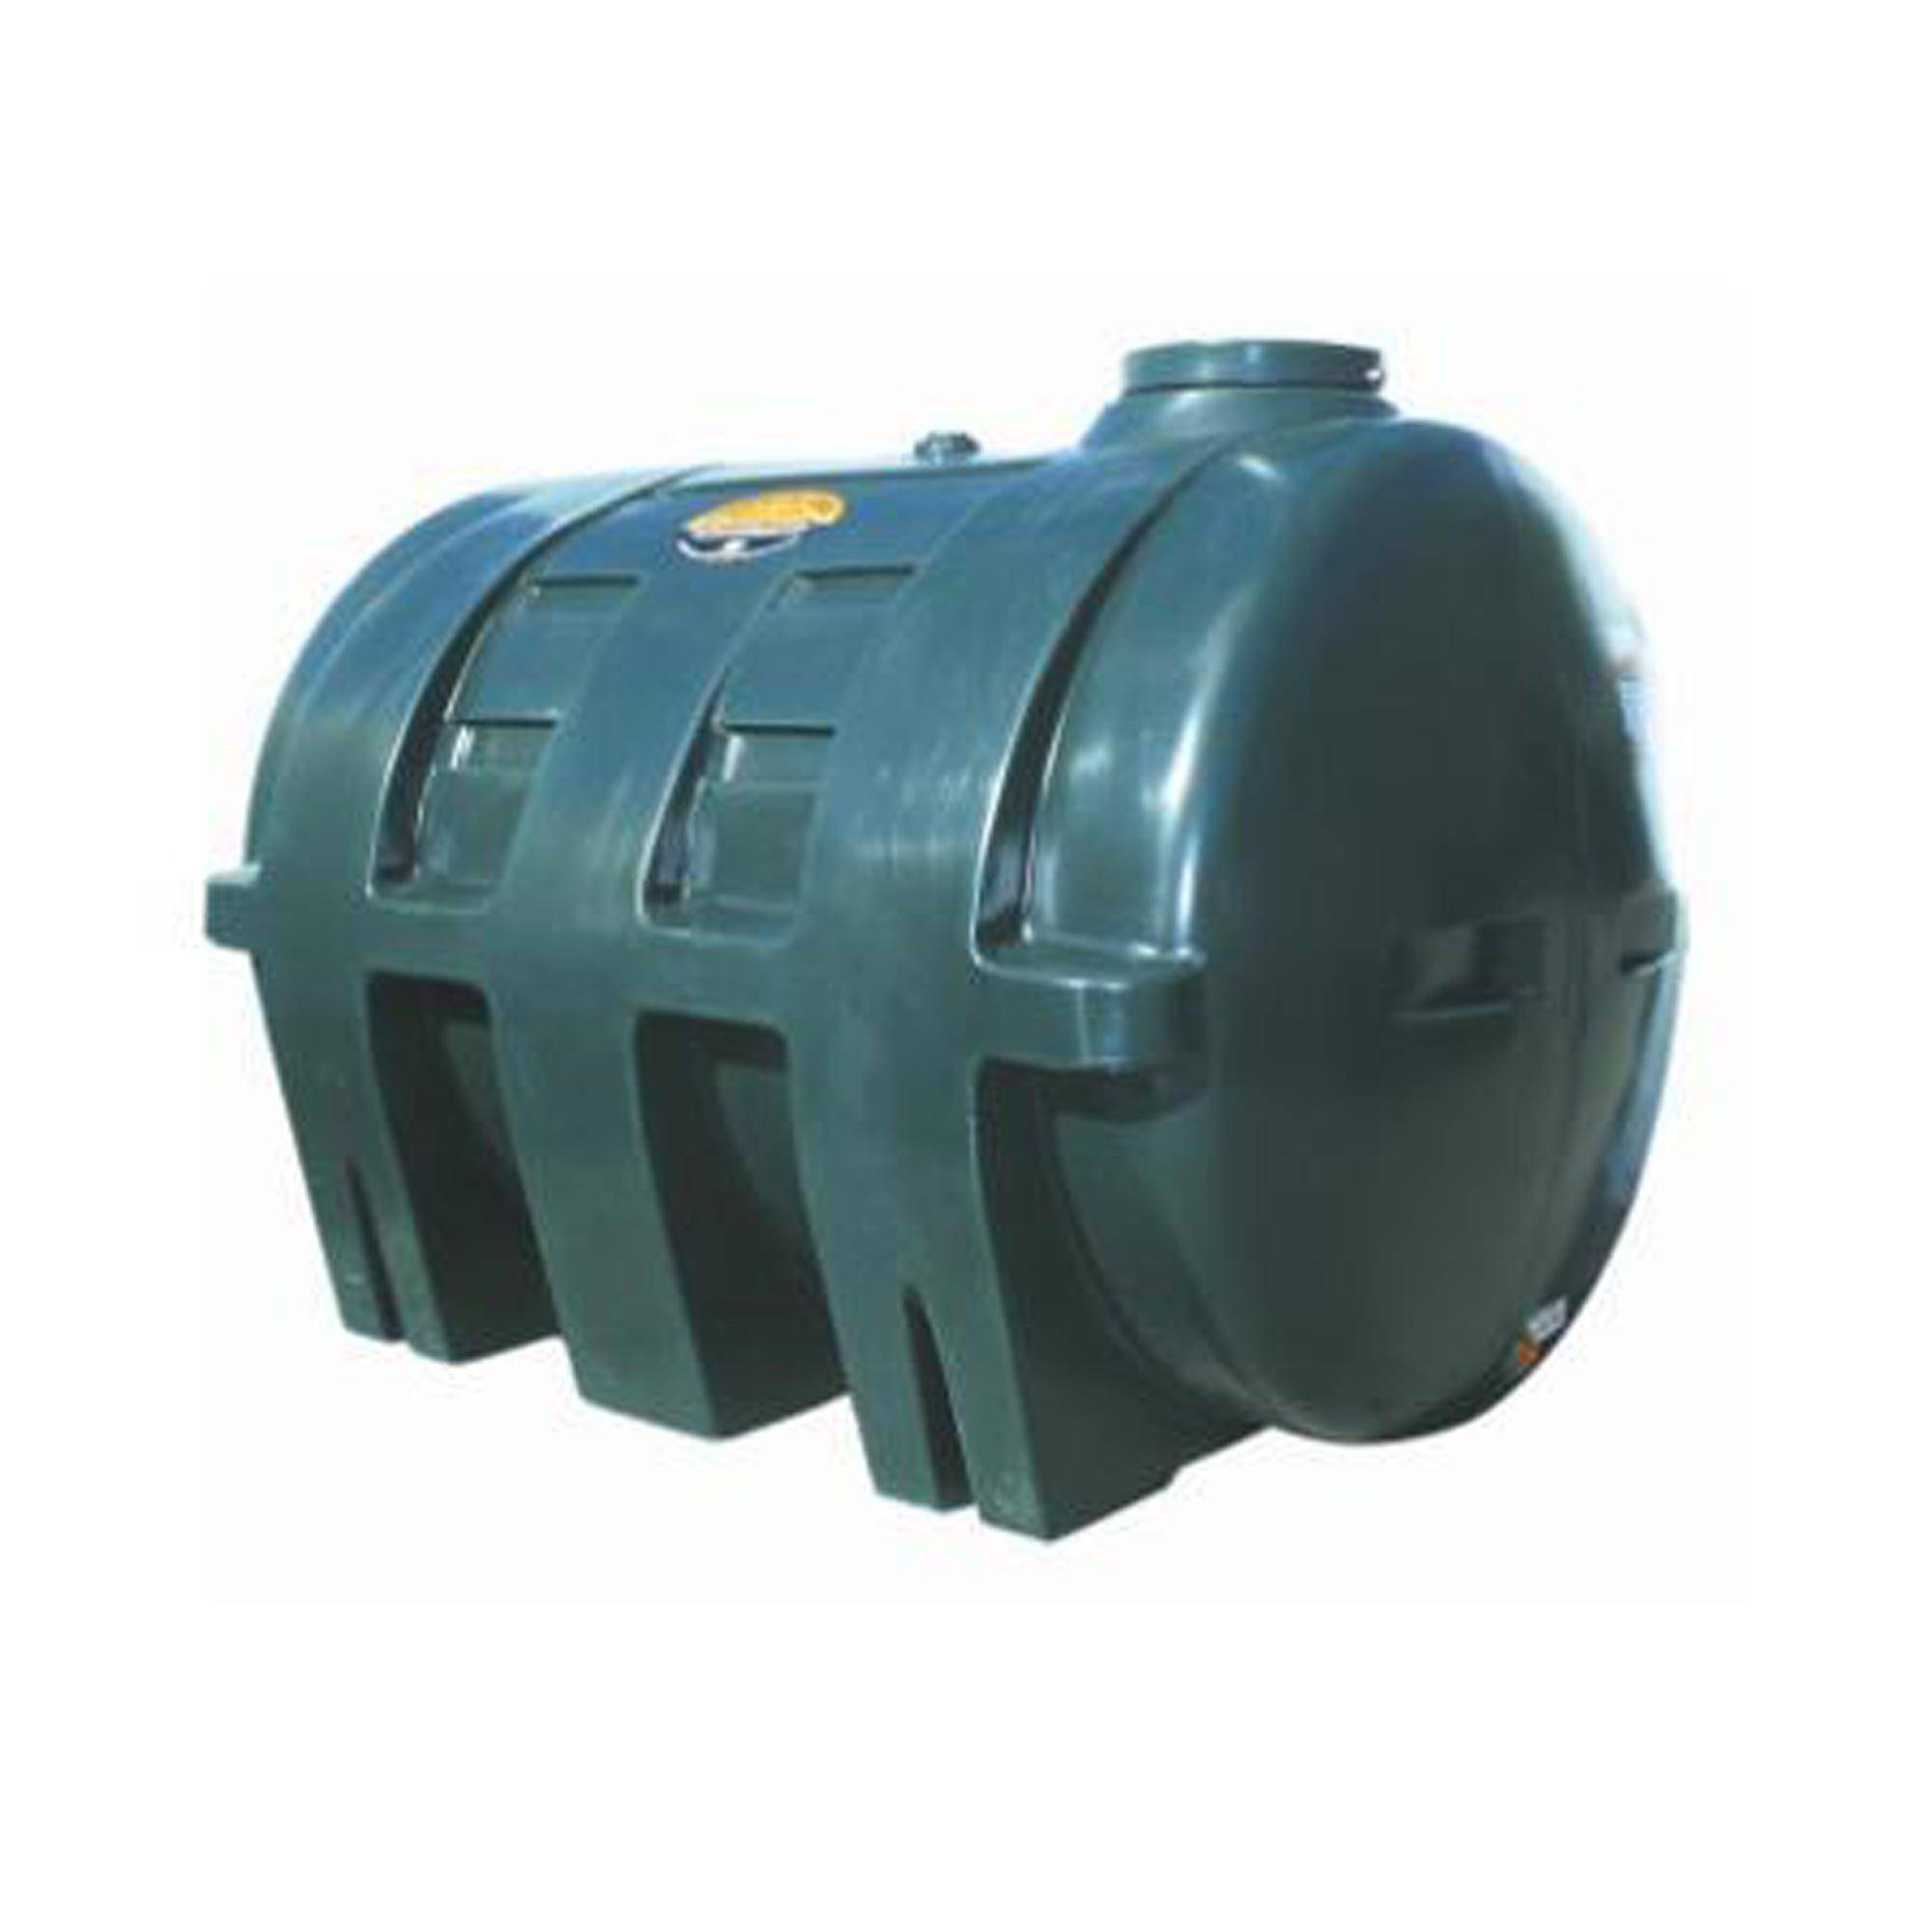 Carbery 1550L Horizontal Single Skin Oil Tank